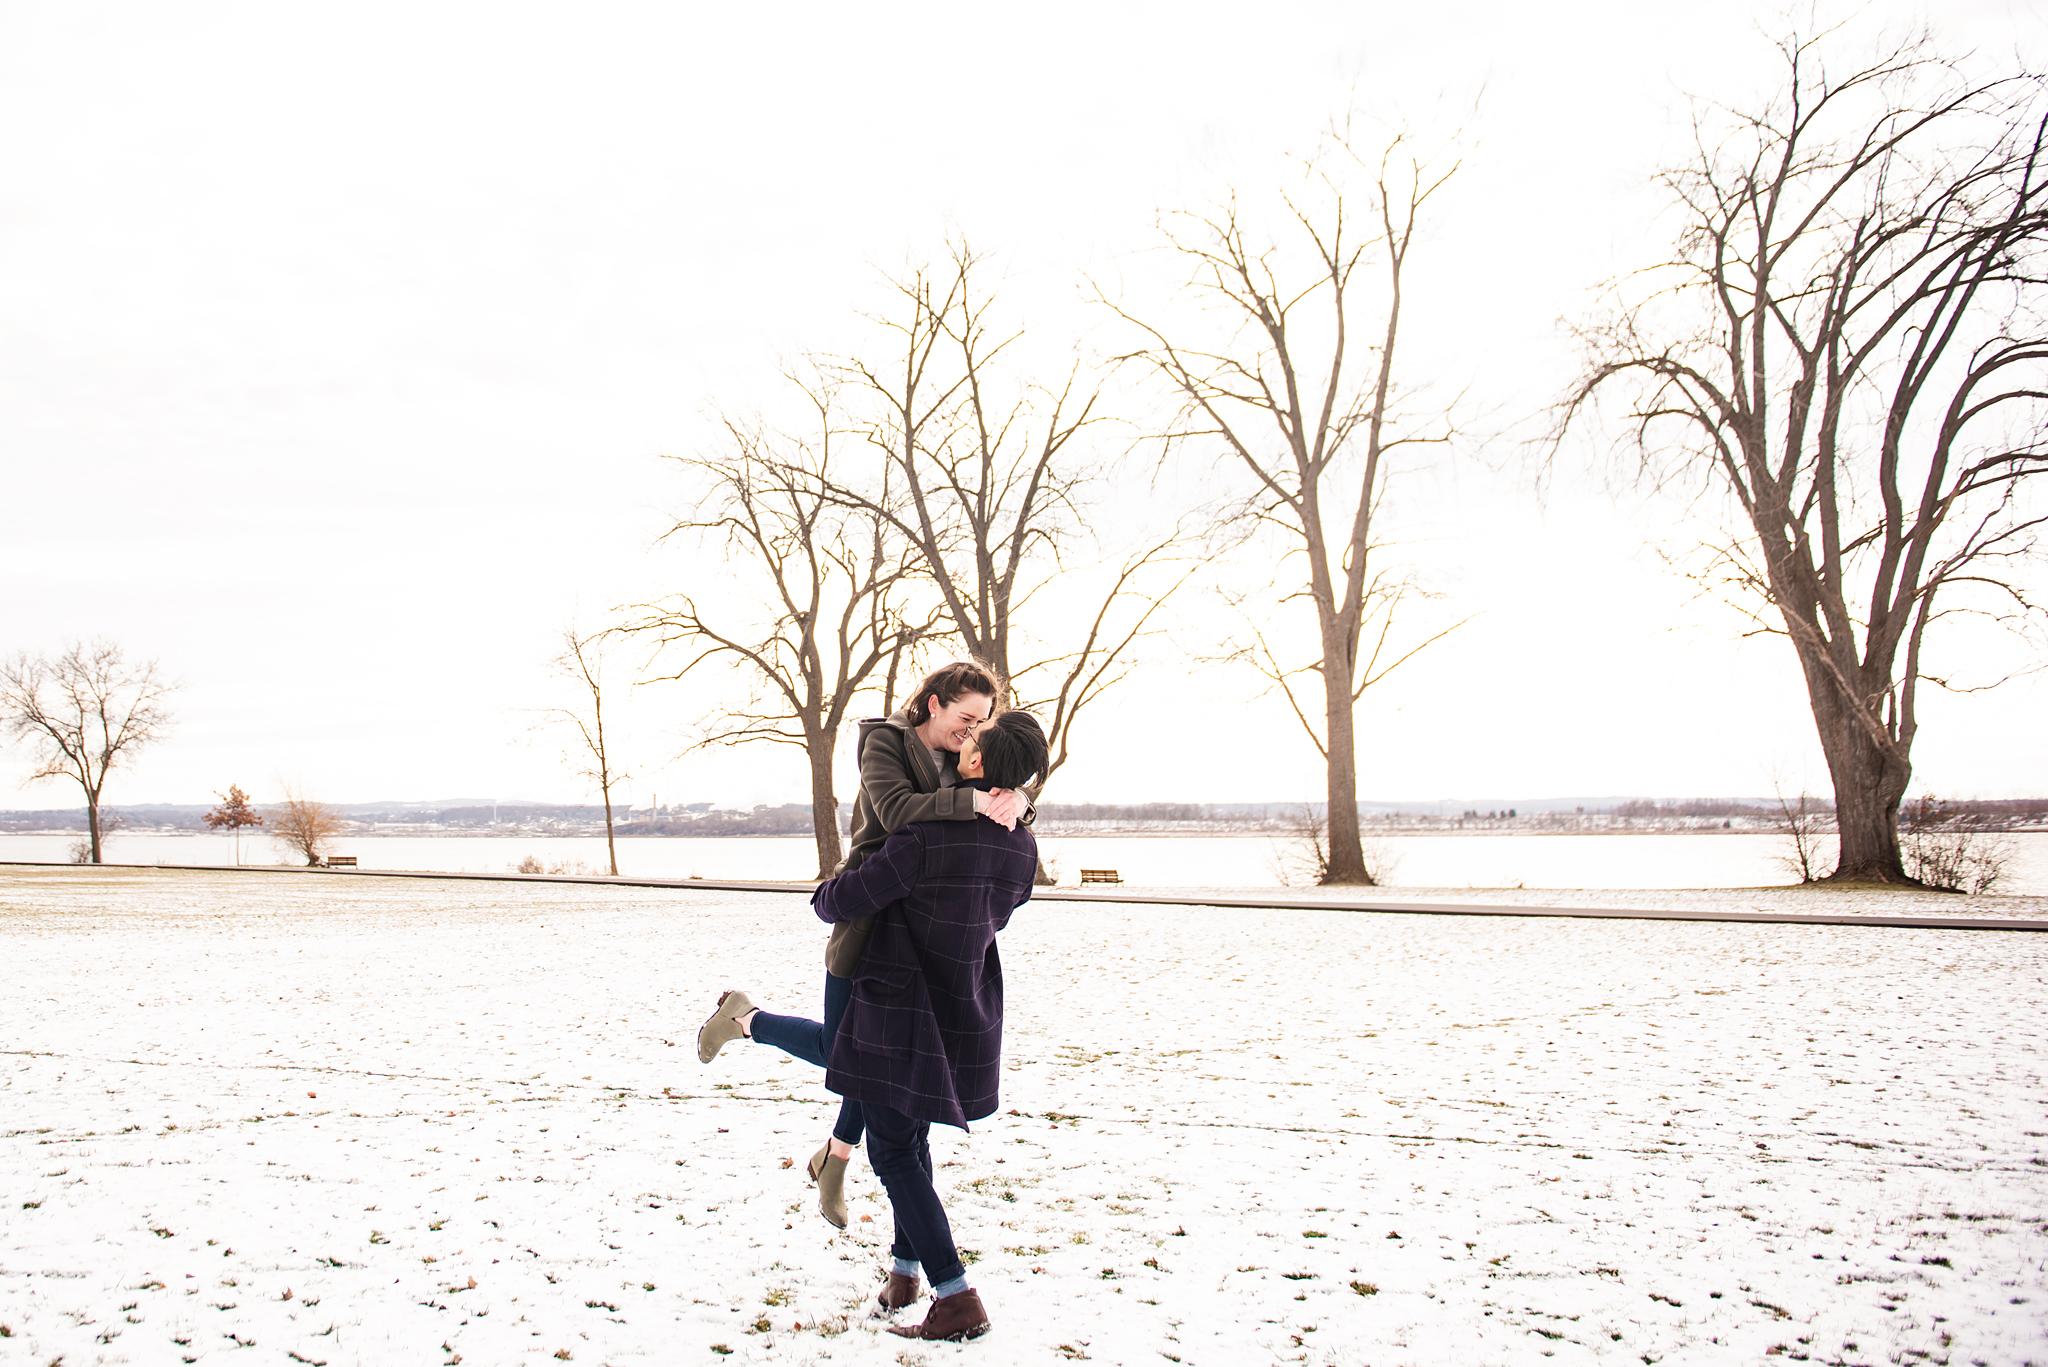 Onondaga_Lake_Park_Syracuse_Engagement_Session_JILL_STUDIO_Rochester_NY_Photographer_DSC_3398.jpg